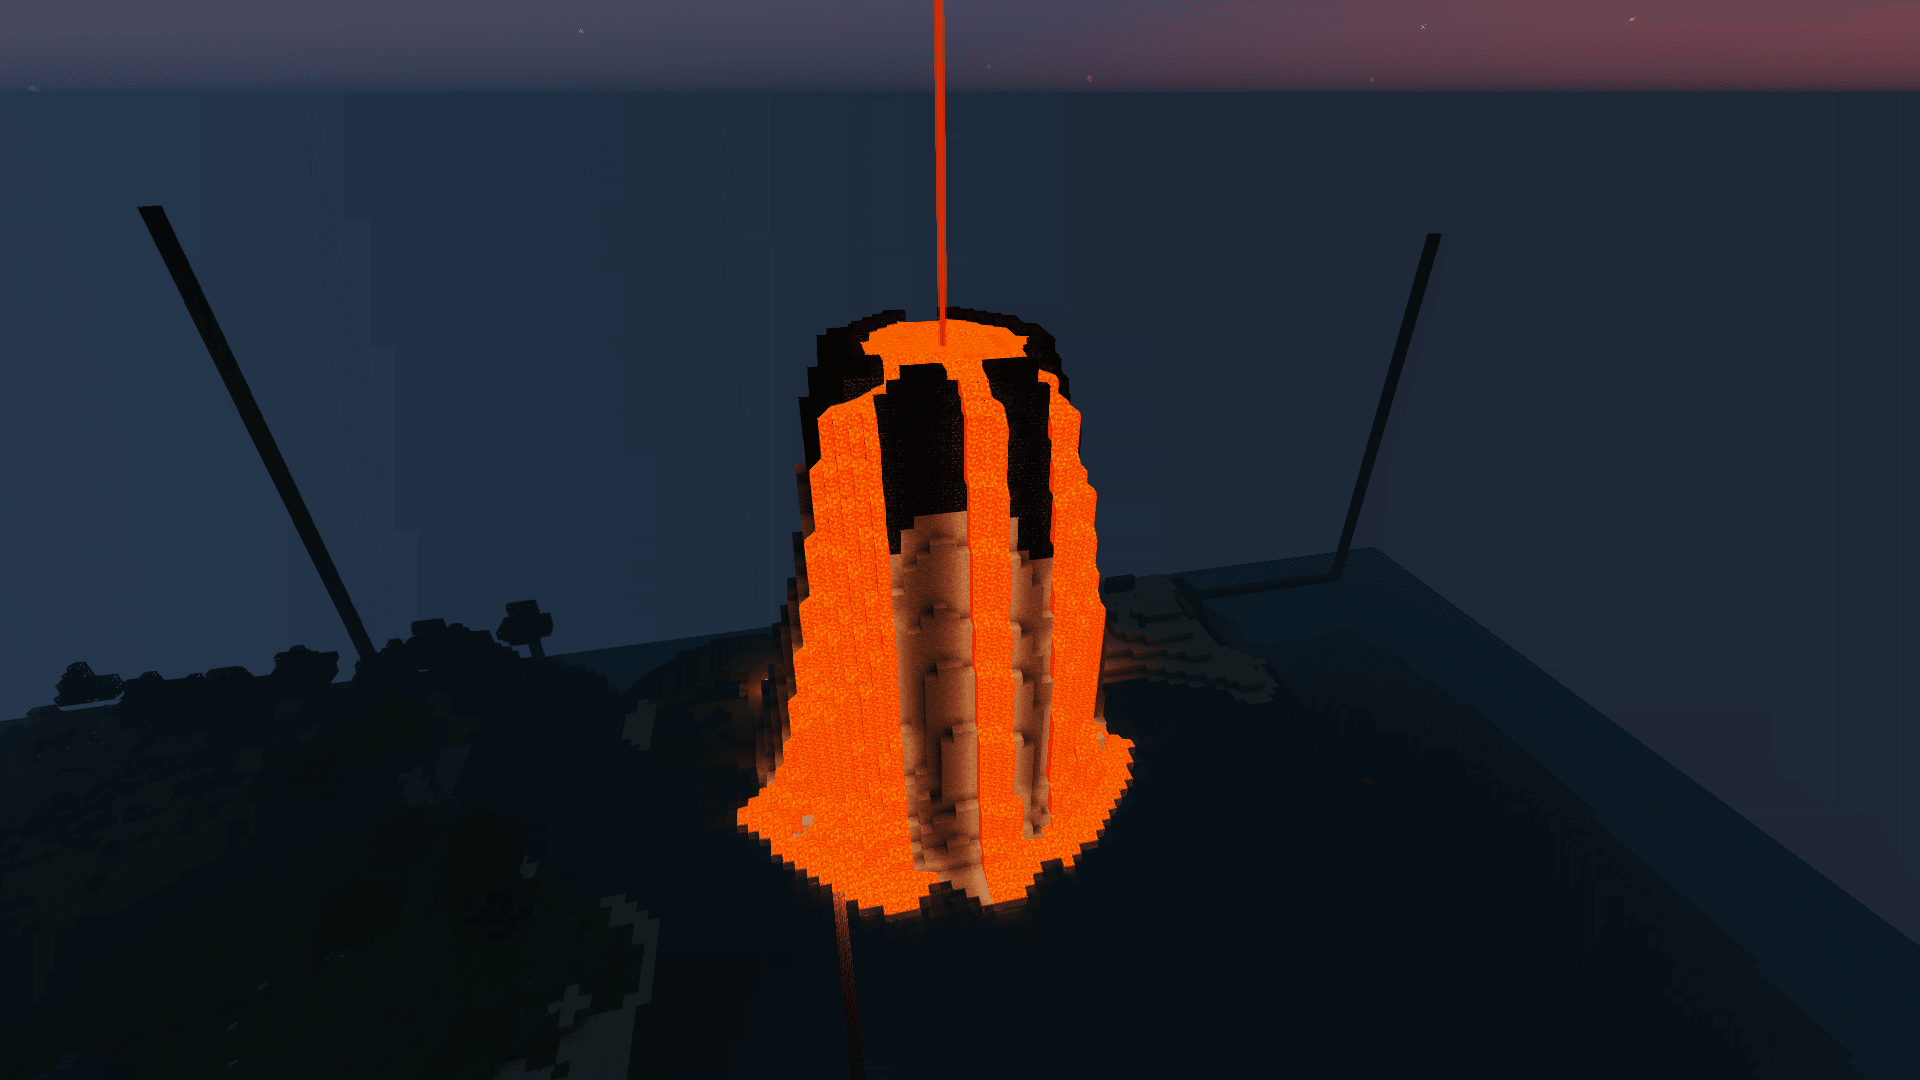 [Timelapse] Island #2: Volcanic Eruption